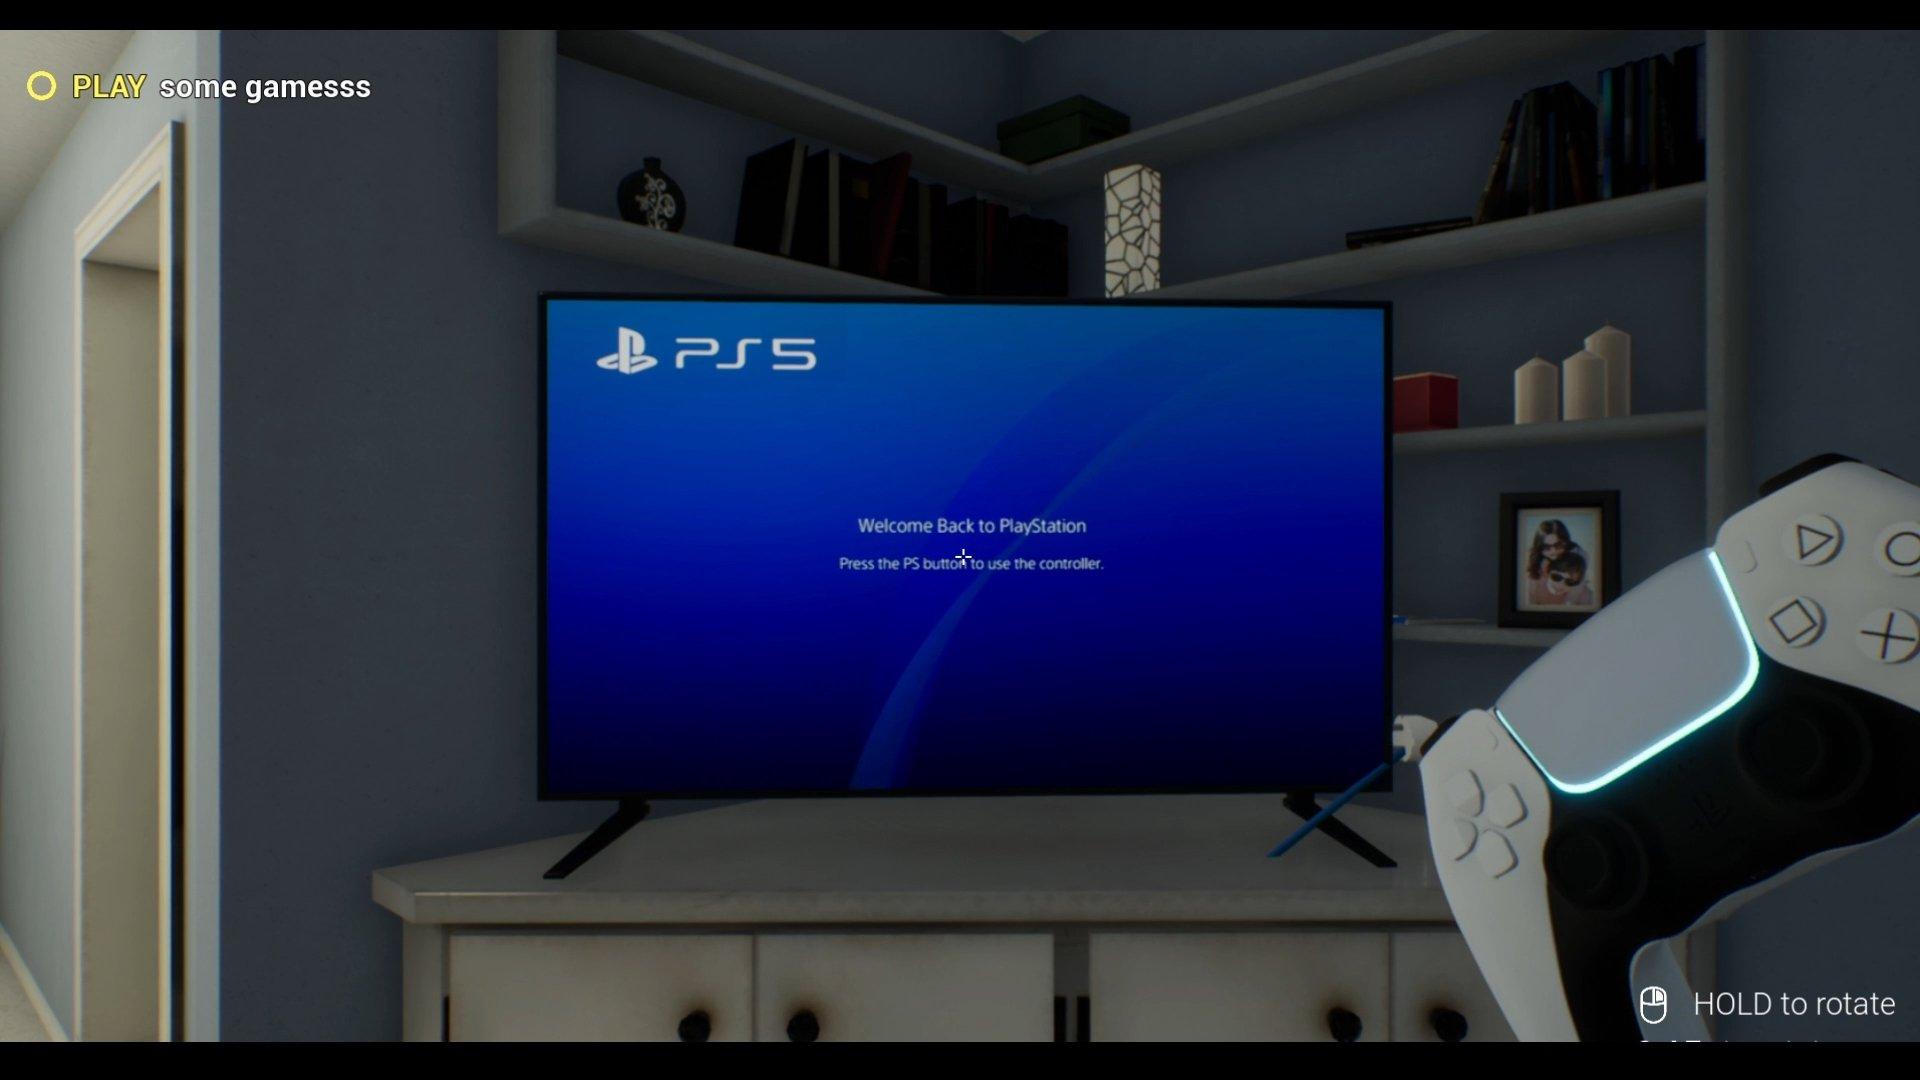 Playstation 5 simulator